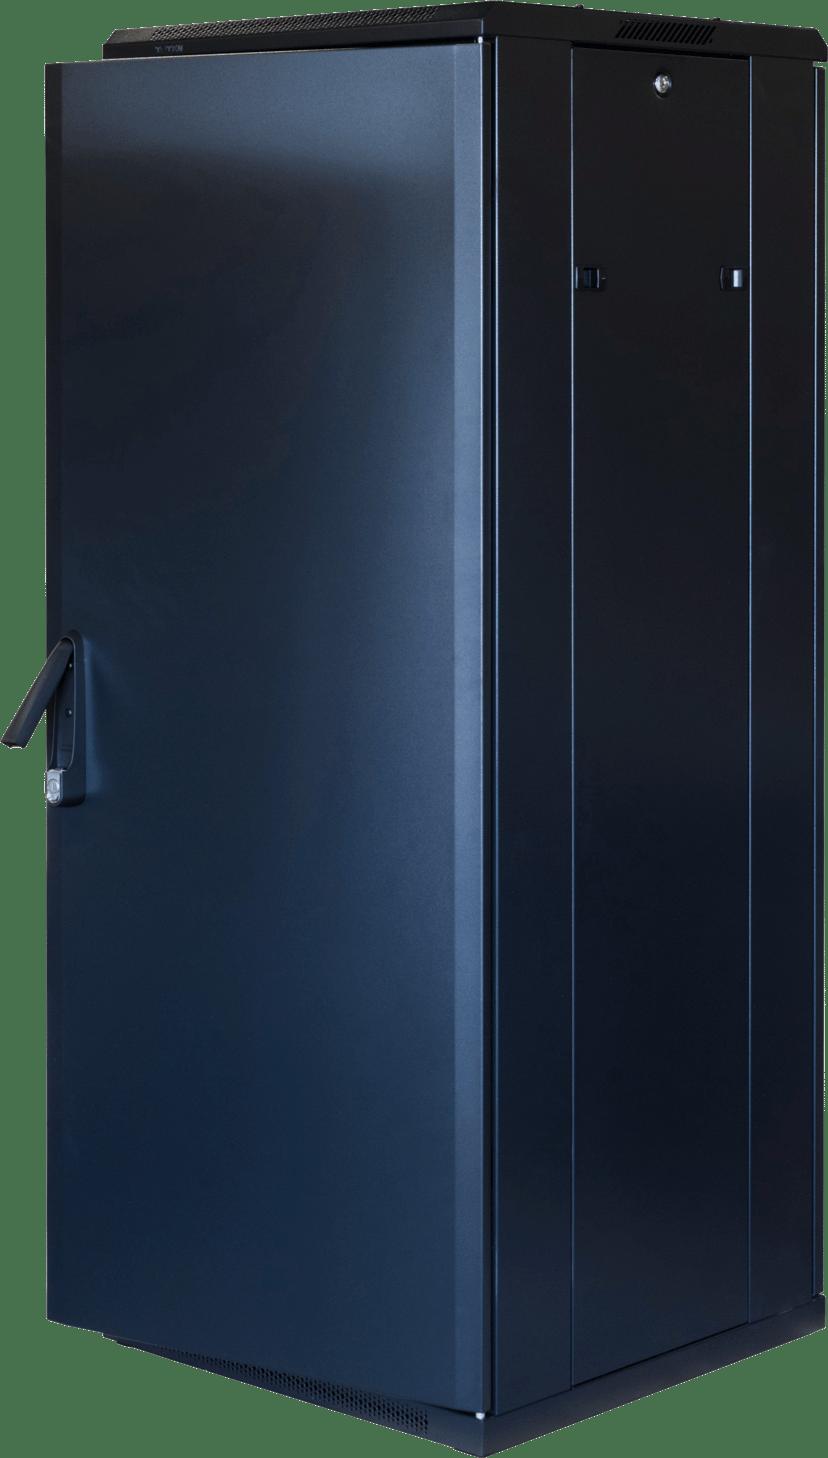 "Toten G6 19"" Rackskåp 32U 600x600 Glas/Metalldörr"